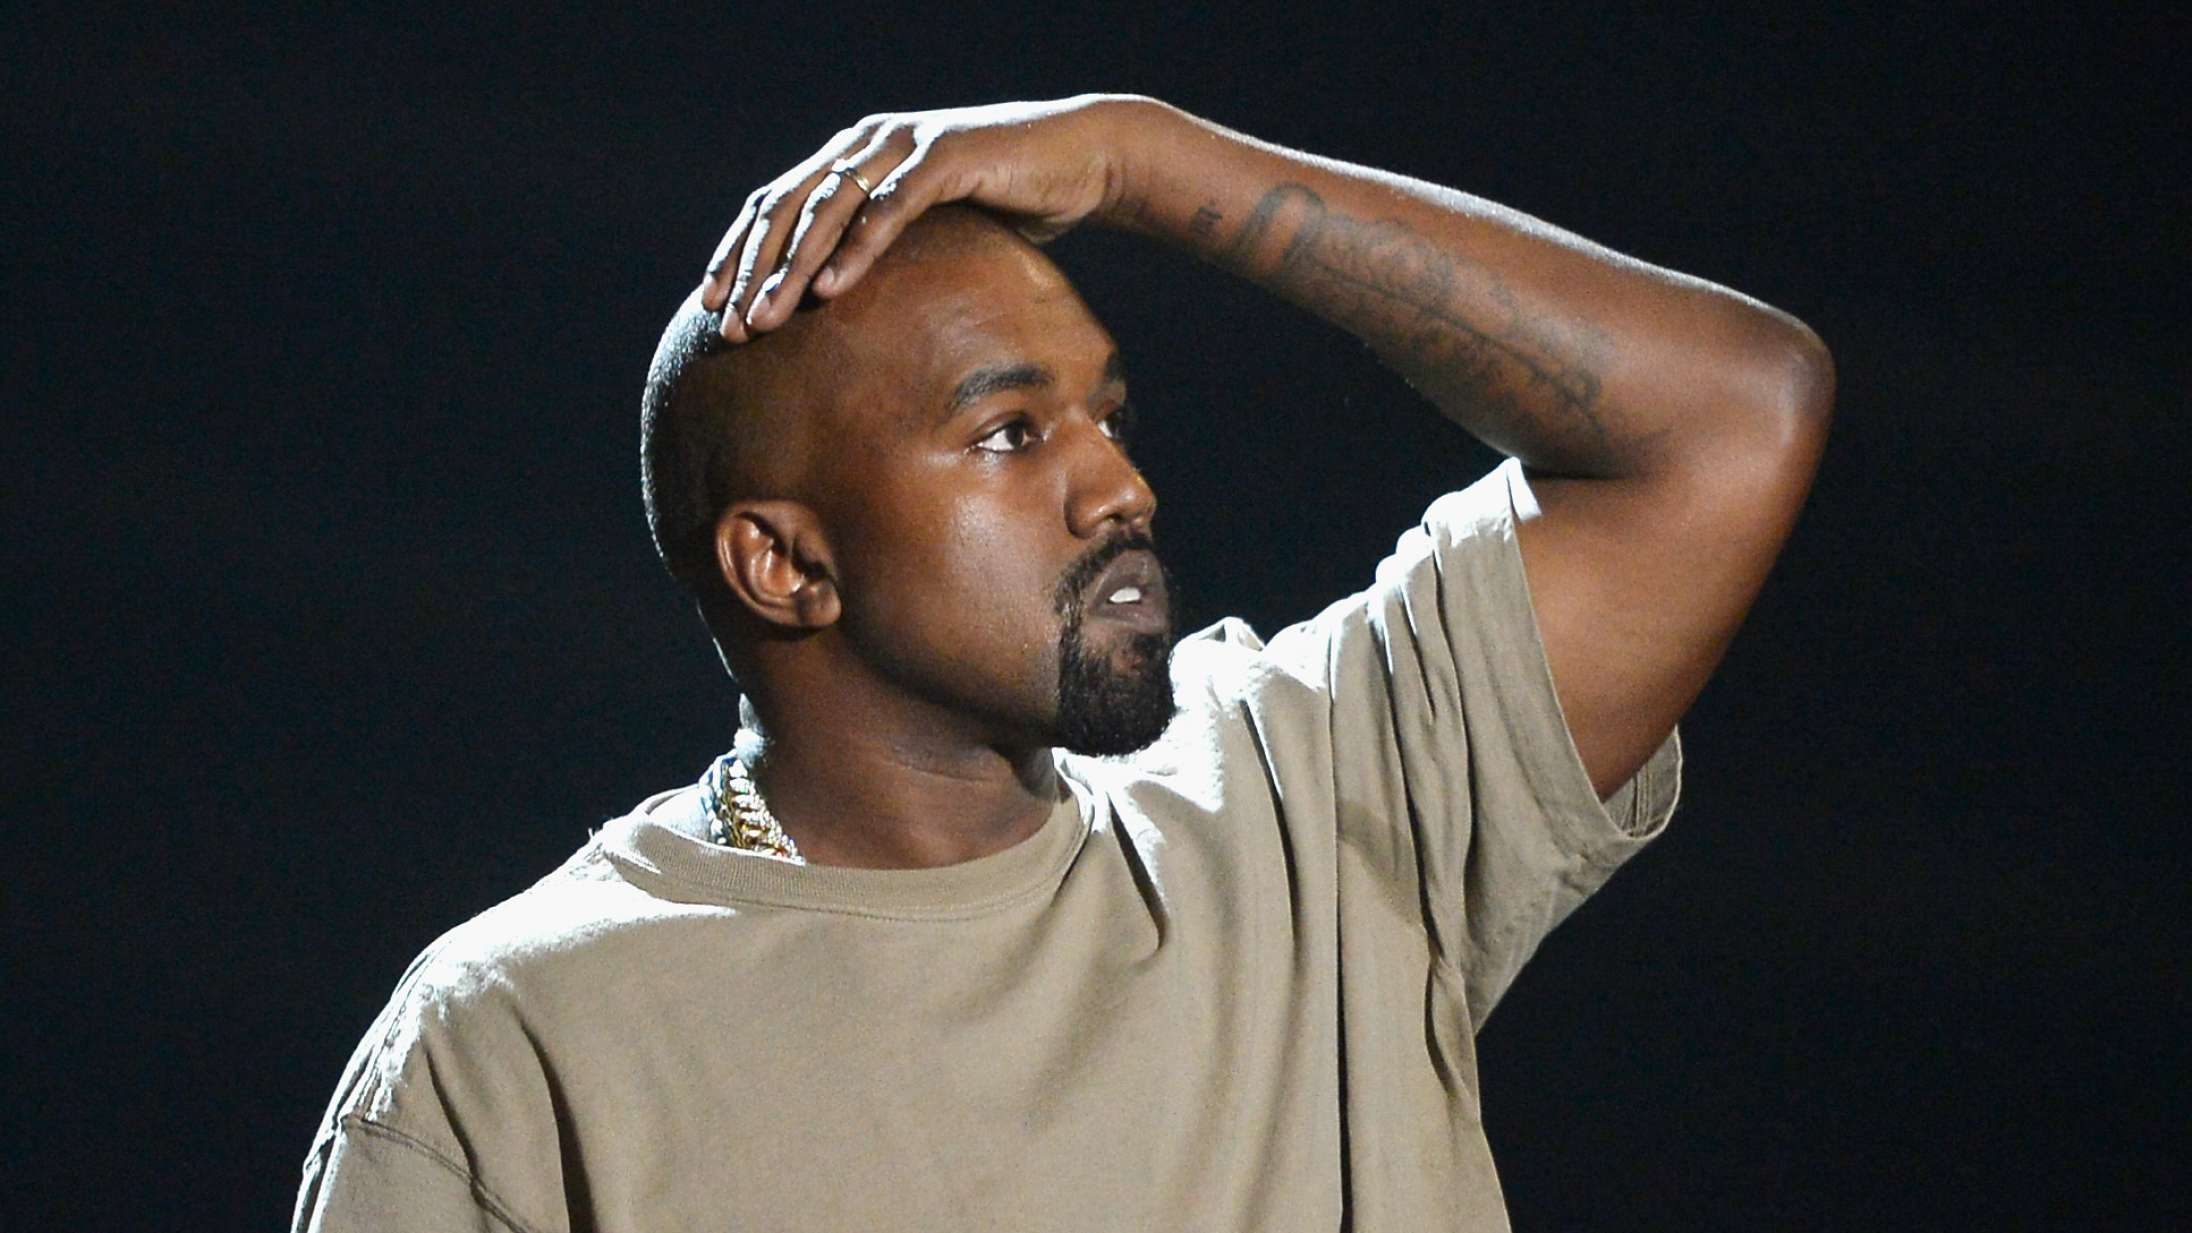 Gurli Gris retter skytset mod Kanye West med 'Donda'-sviner på Twitter